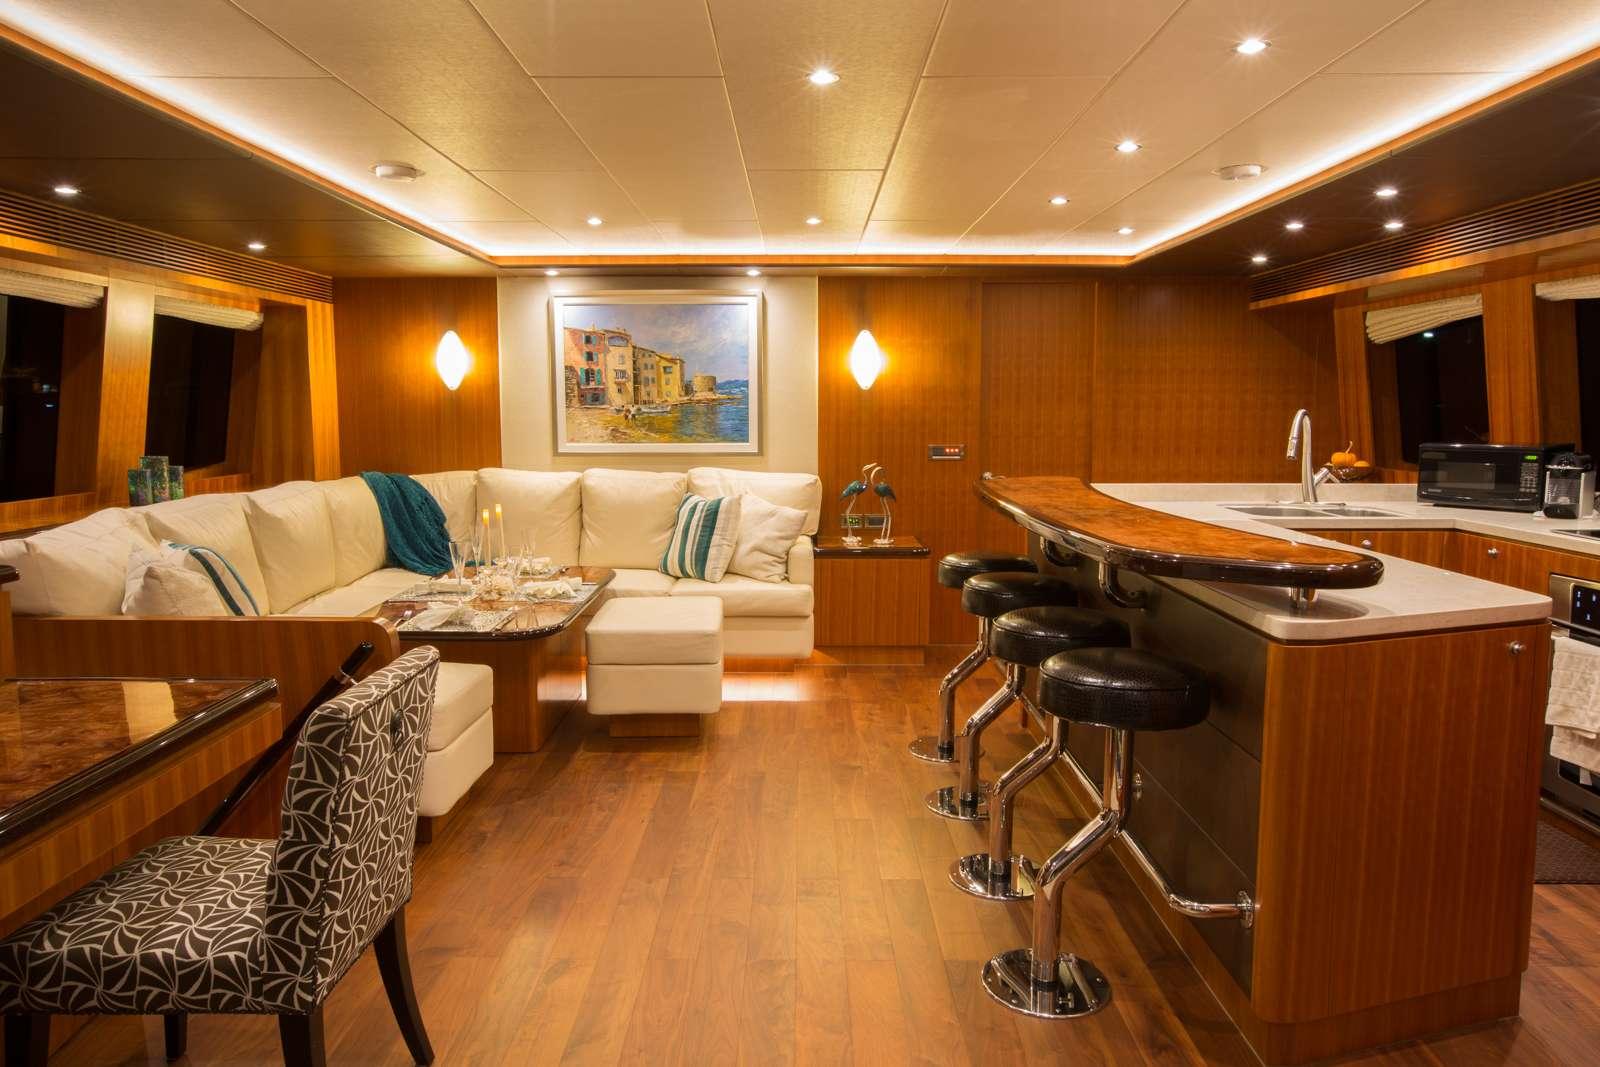 Cat Yacht 'Cat', 6 PAX, 2 Crew, 60.00 Ft, 18.00 Meters, Built 2016, Horizon, Refit Year